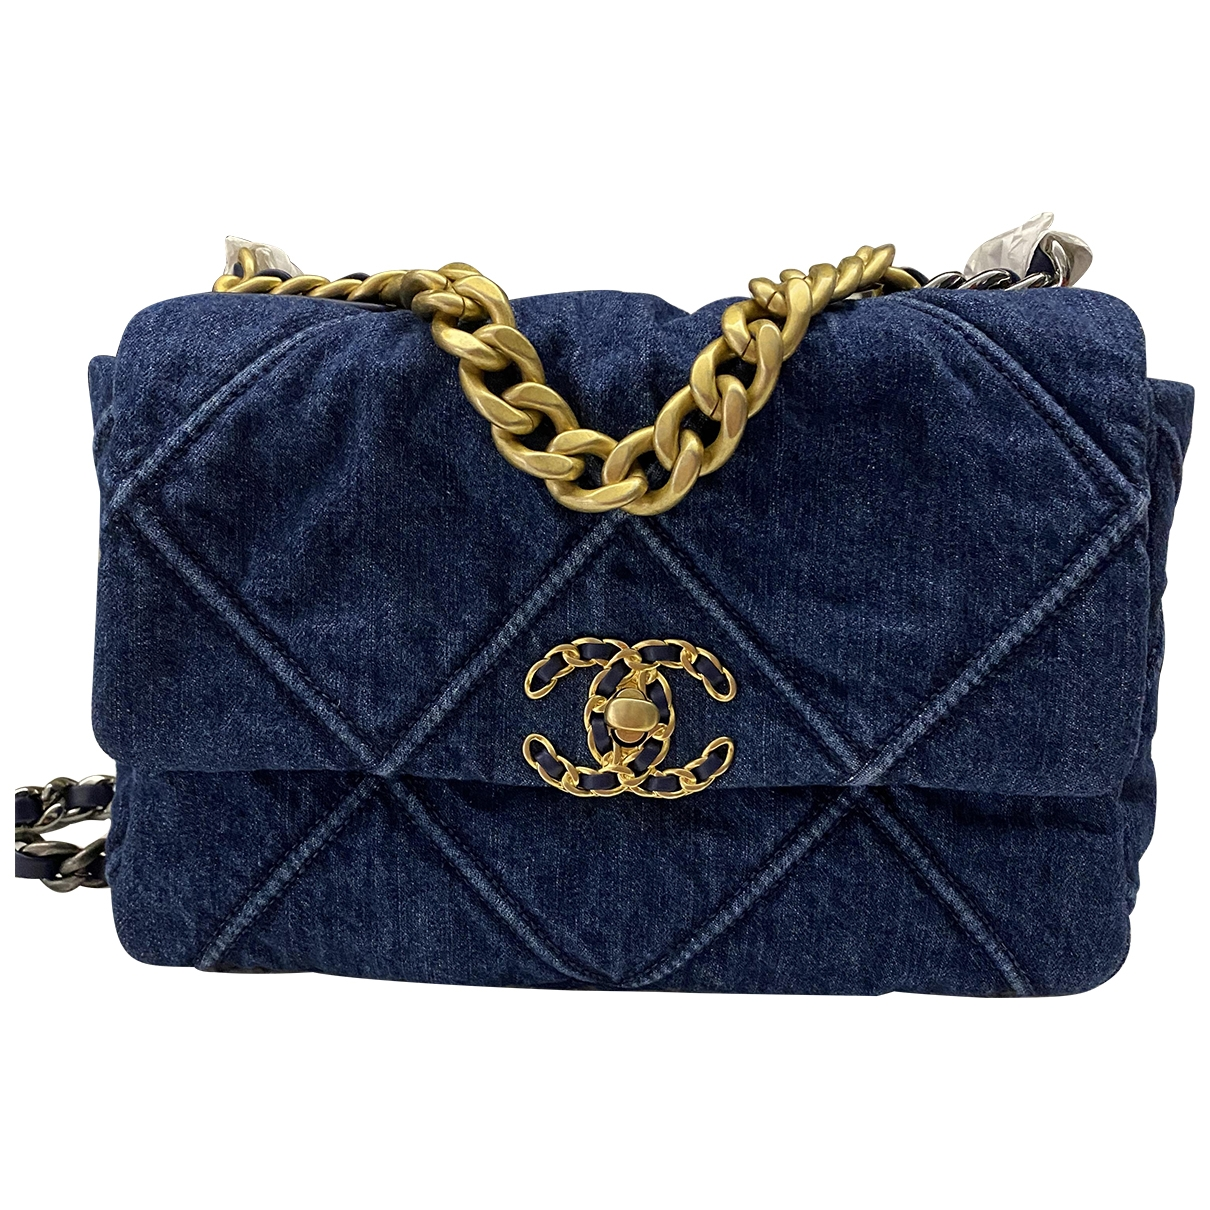 Chanel - Sac a main Chanel 19 pour femme en denim - bleu